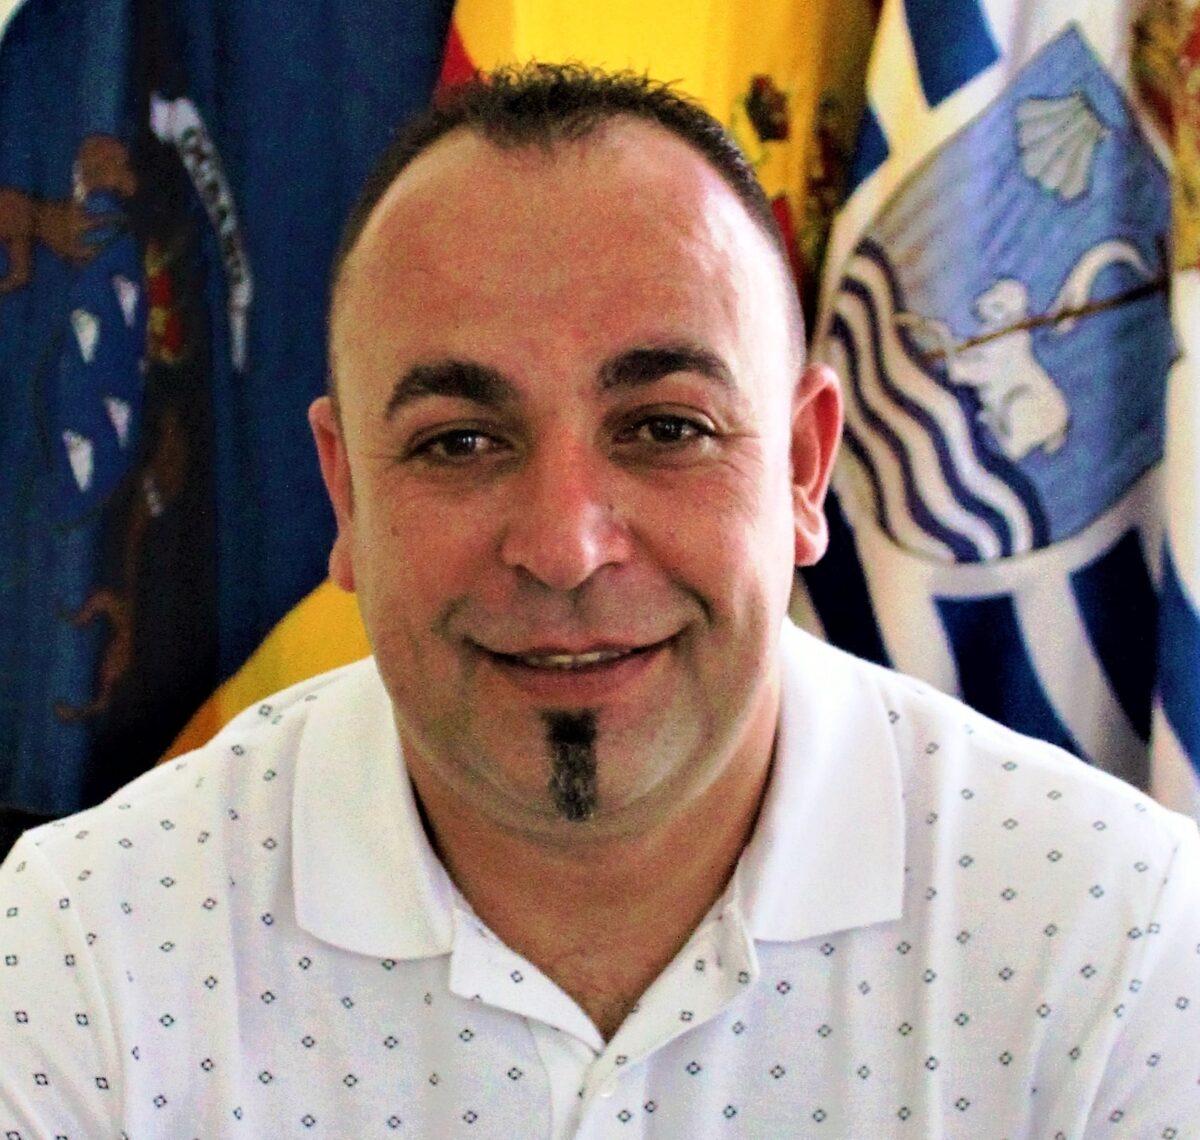 Tercer-Teniente-de-Alcalde.-Jonay-Mendez-Vargas.